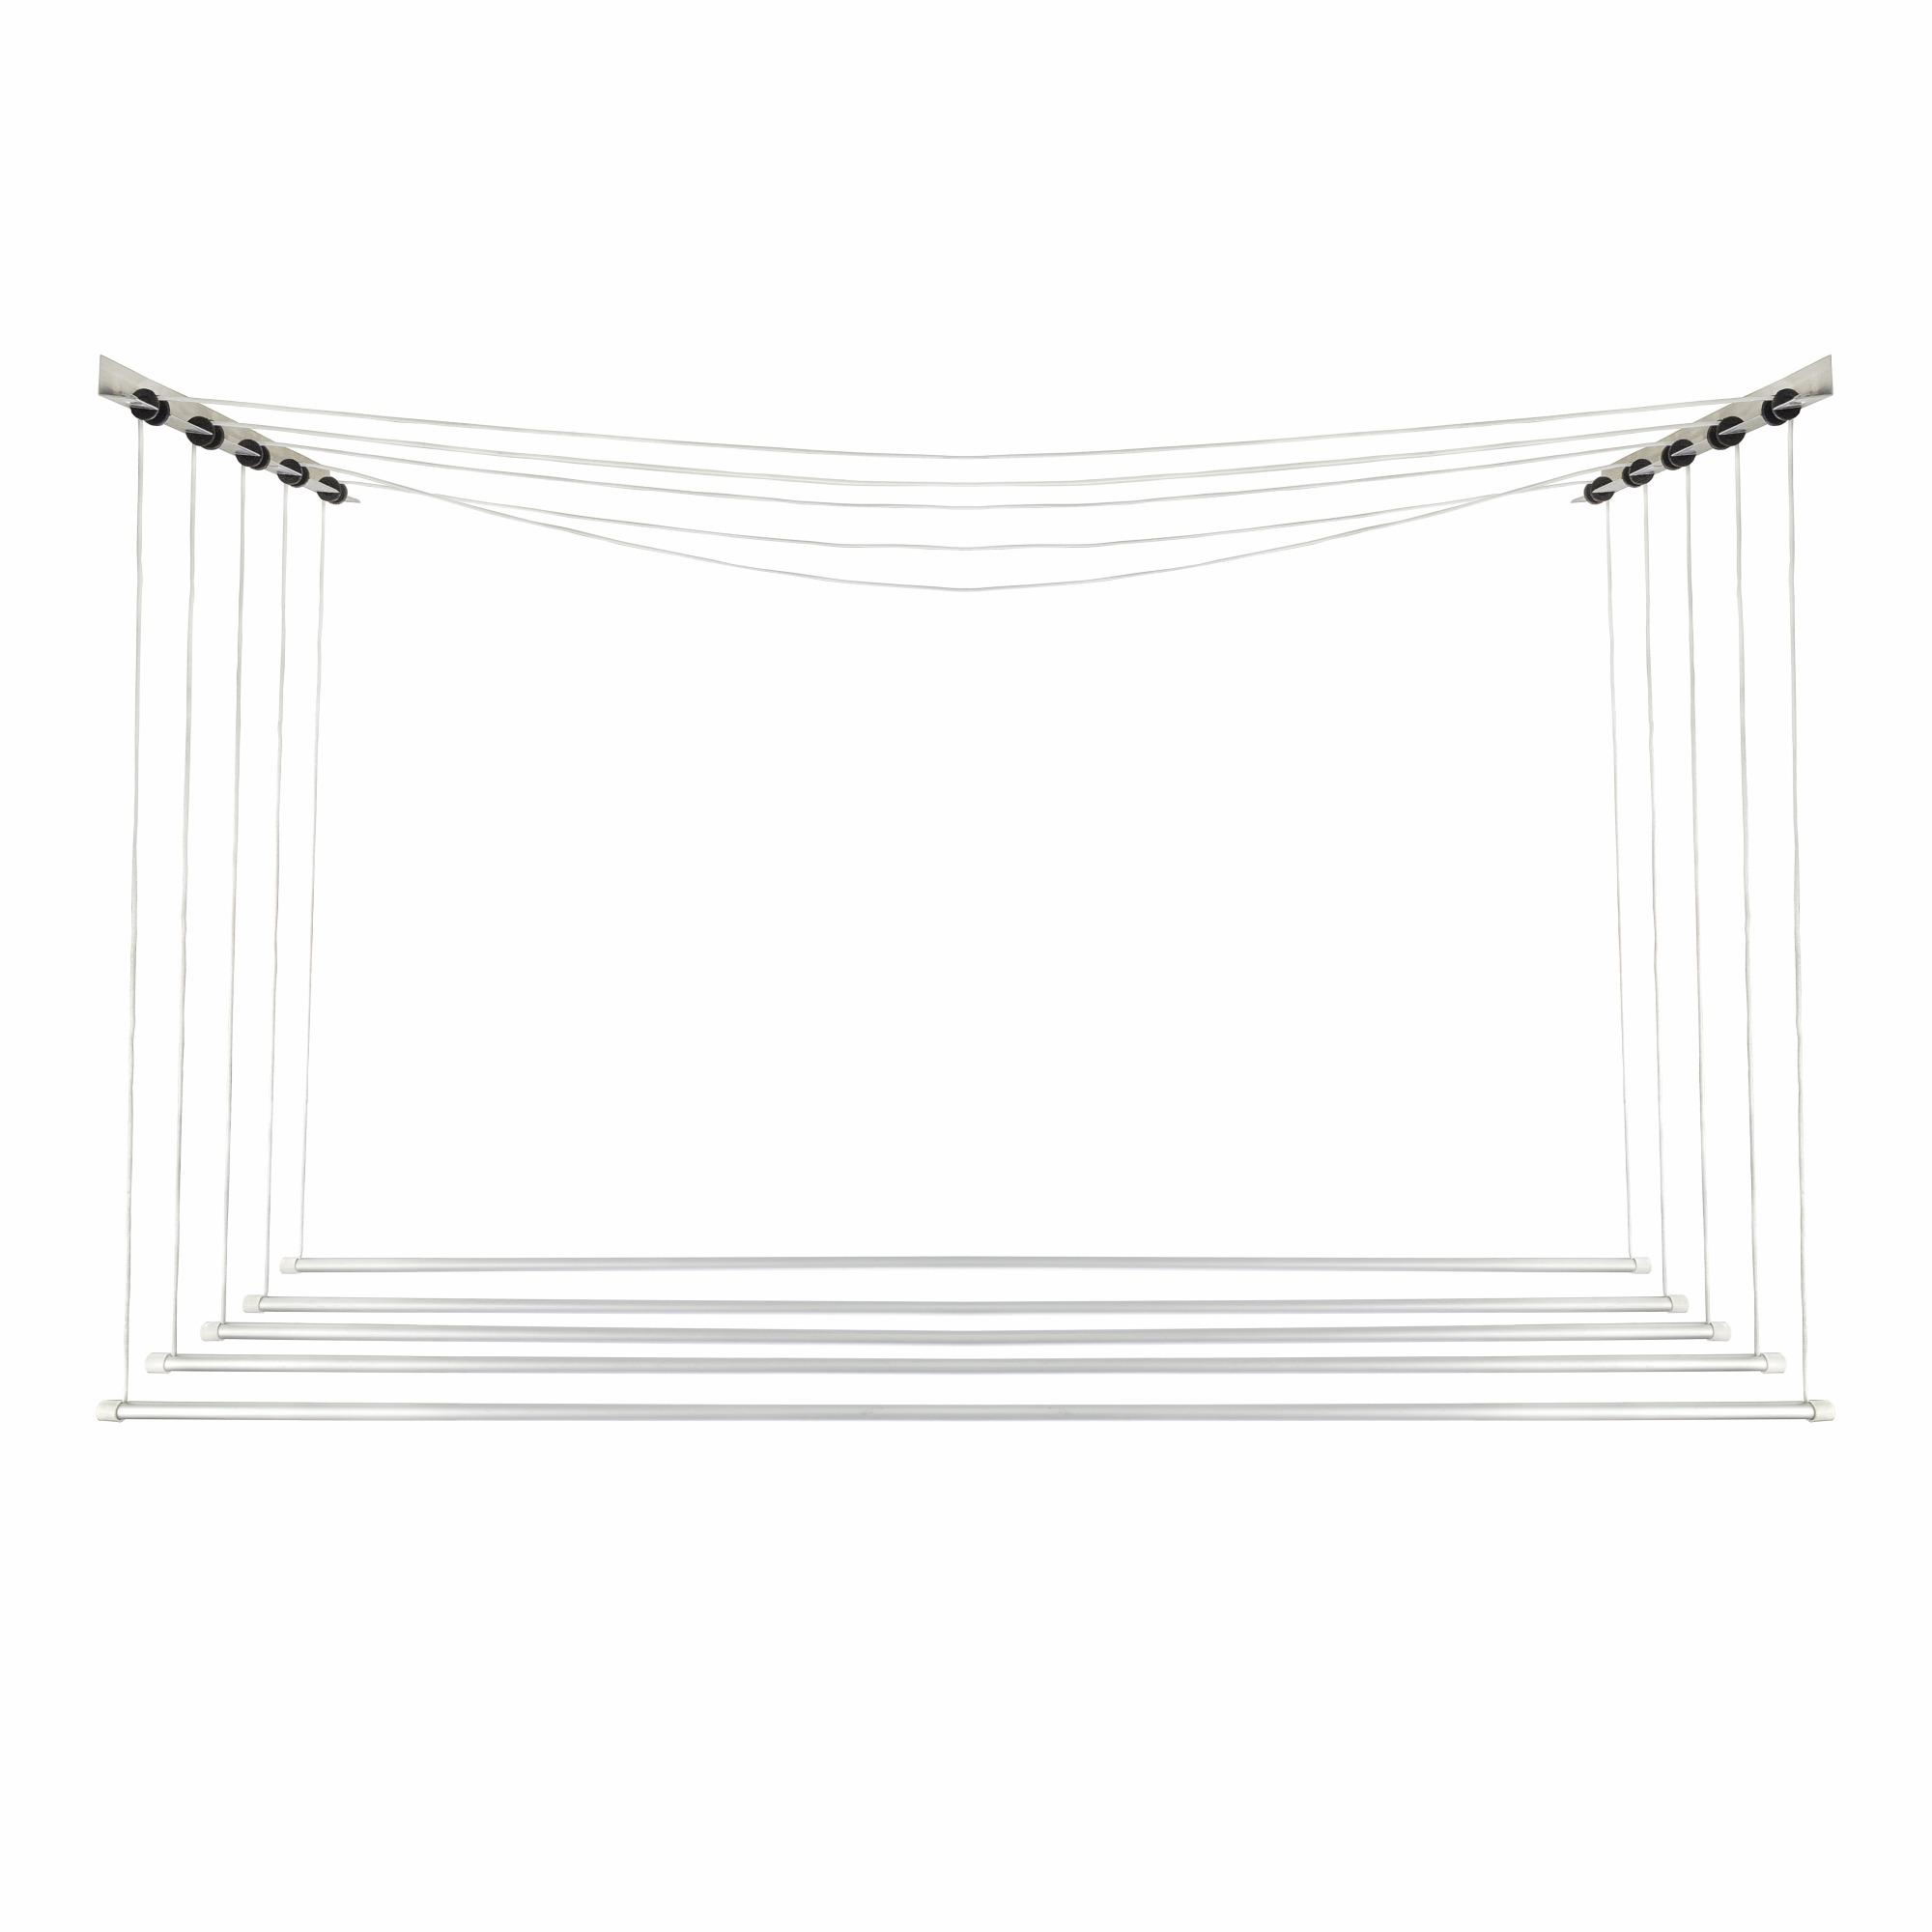 Varal de Teto Individual Aluminio 56X120cm VI2 - SoVarais